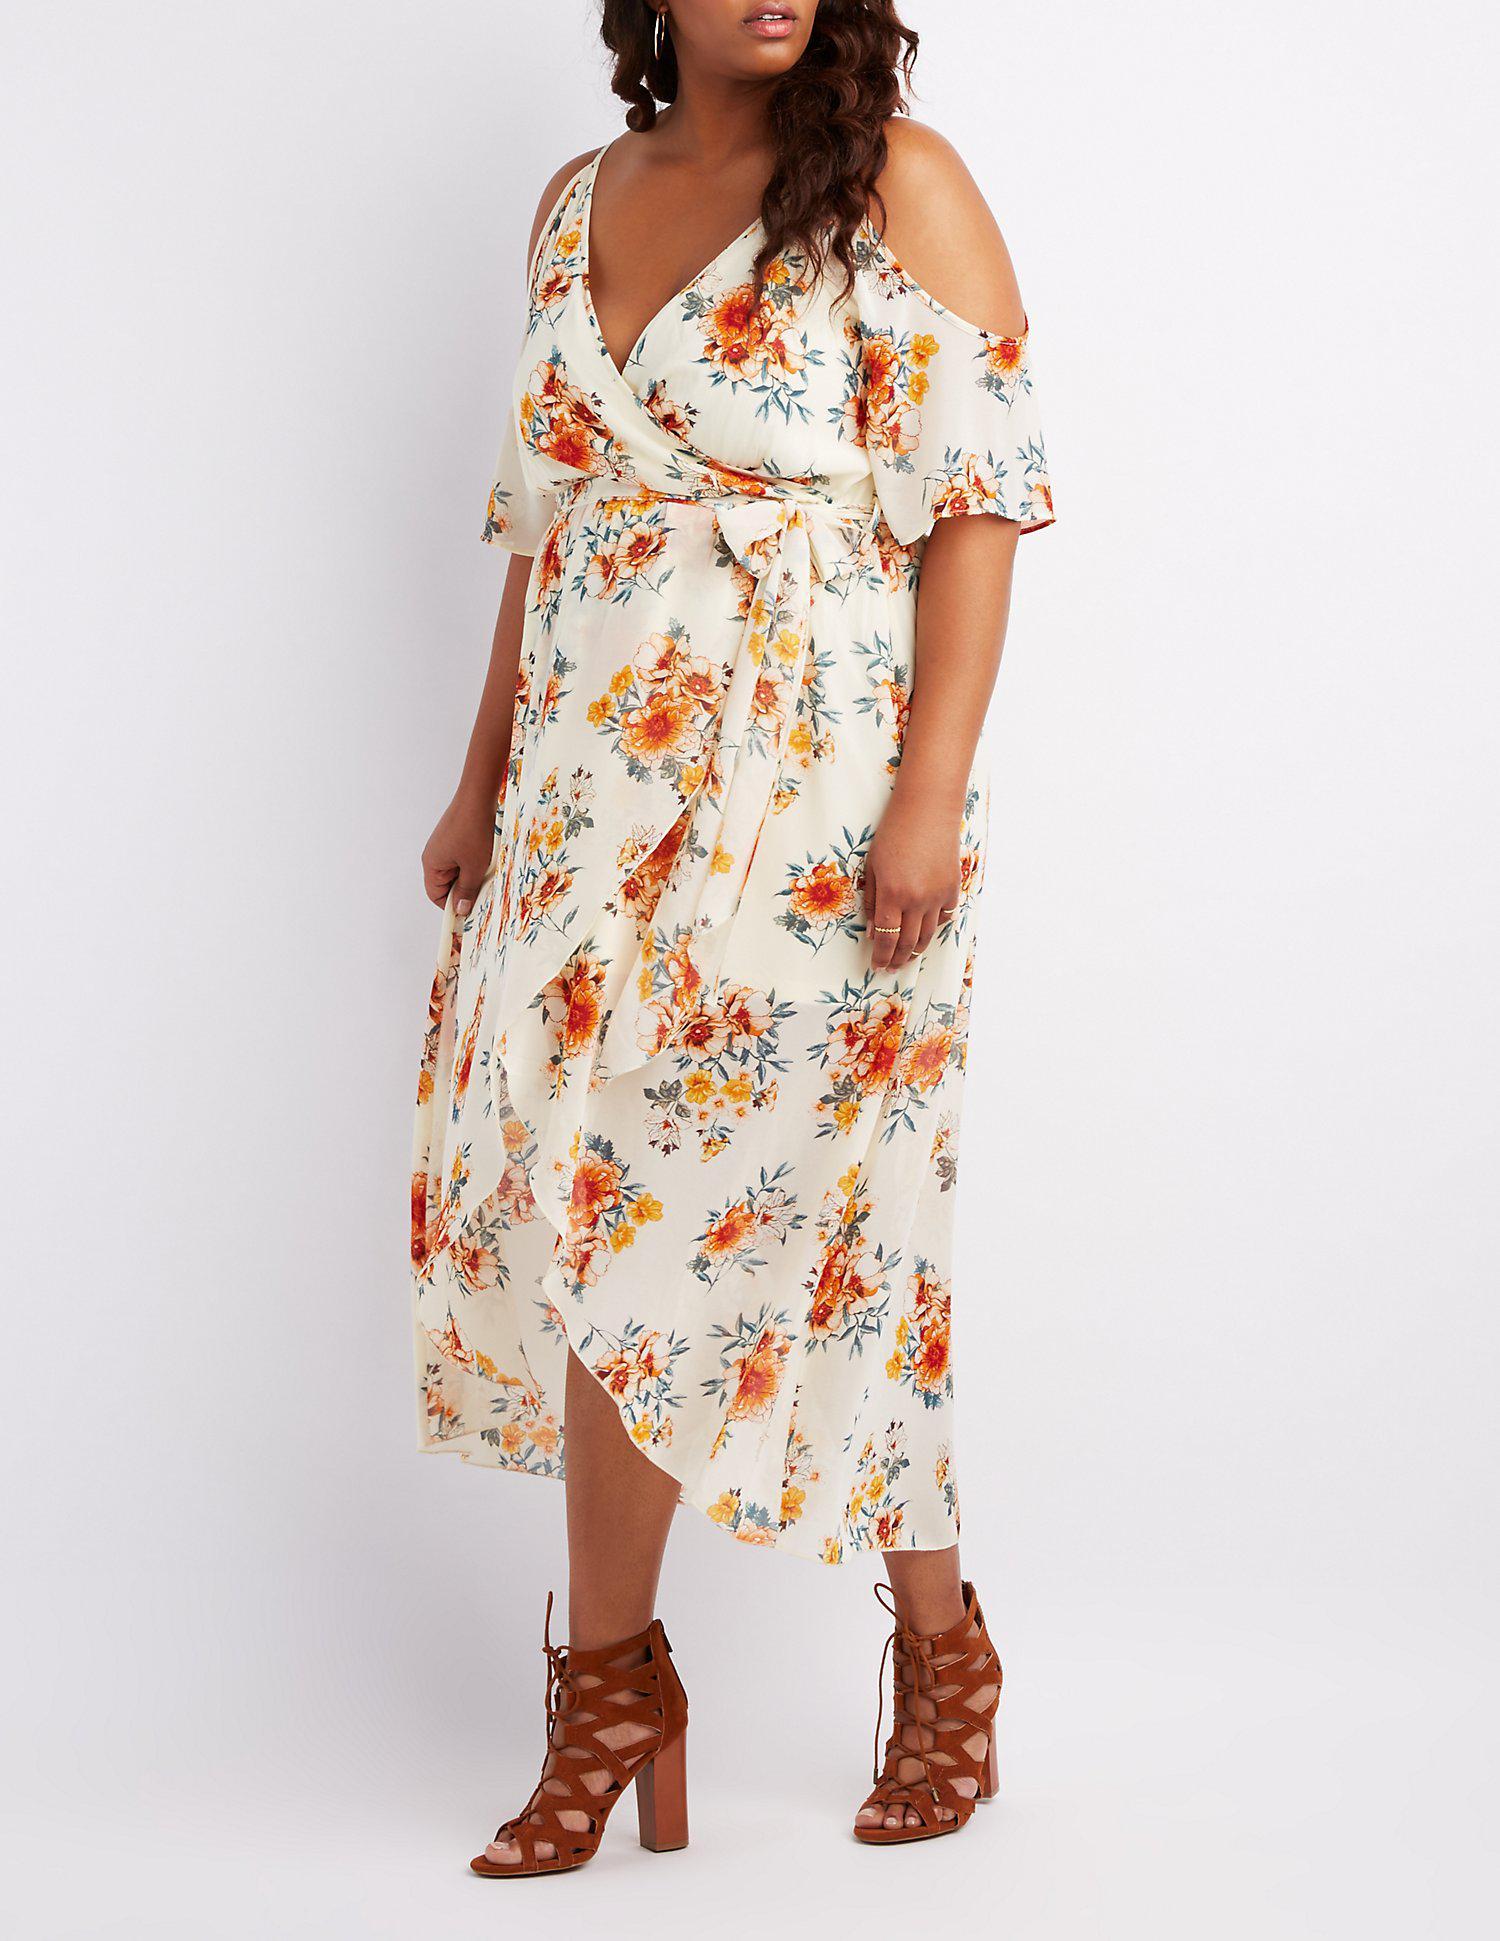 b3f4079b95f Lyst - Charlotte Russe Plus Size Floral Surplice Cold Shoulder Maxi ...